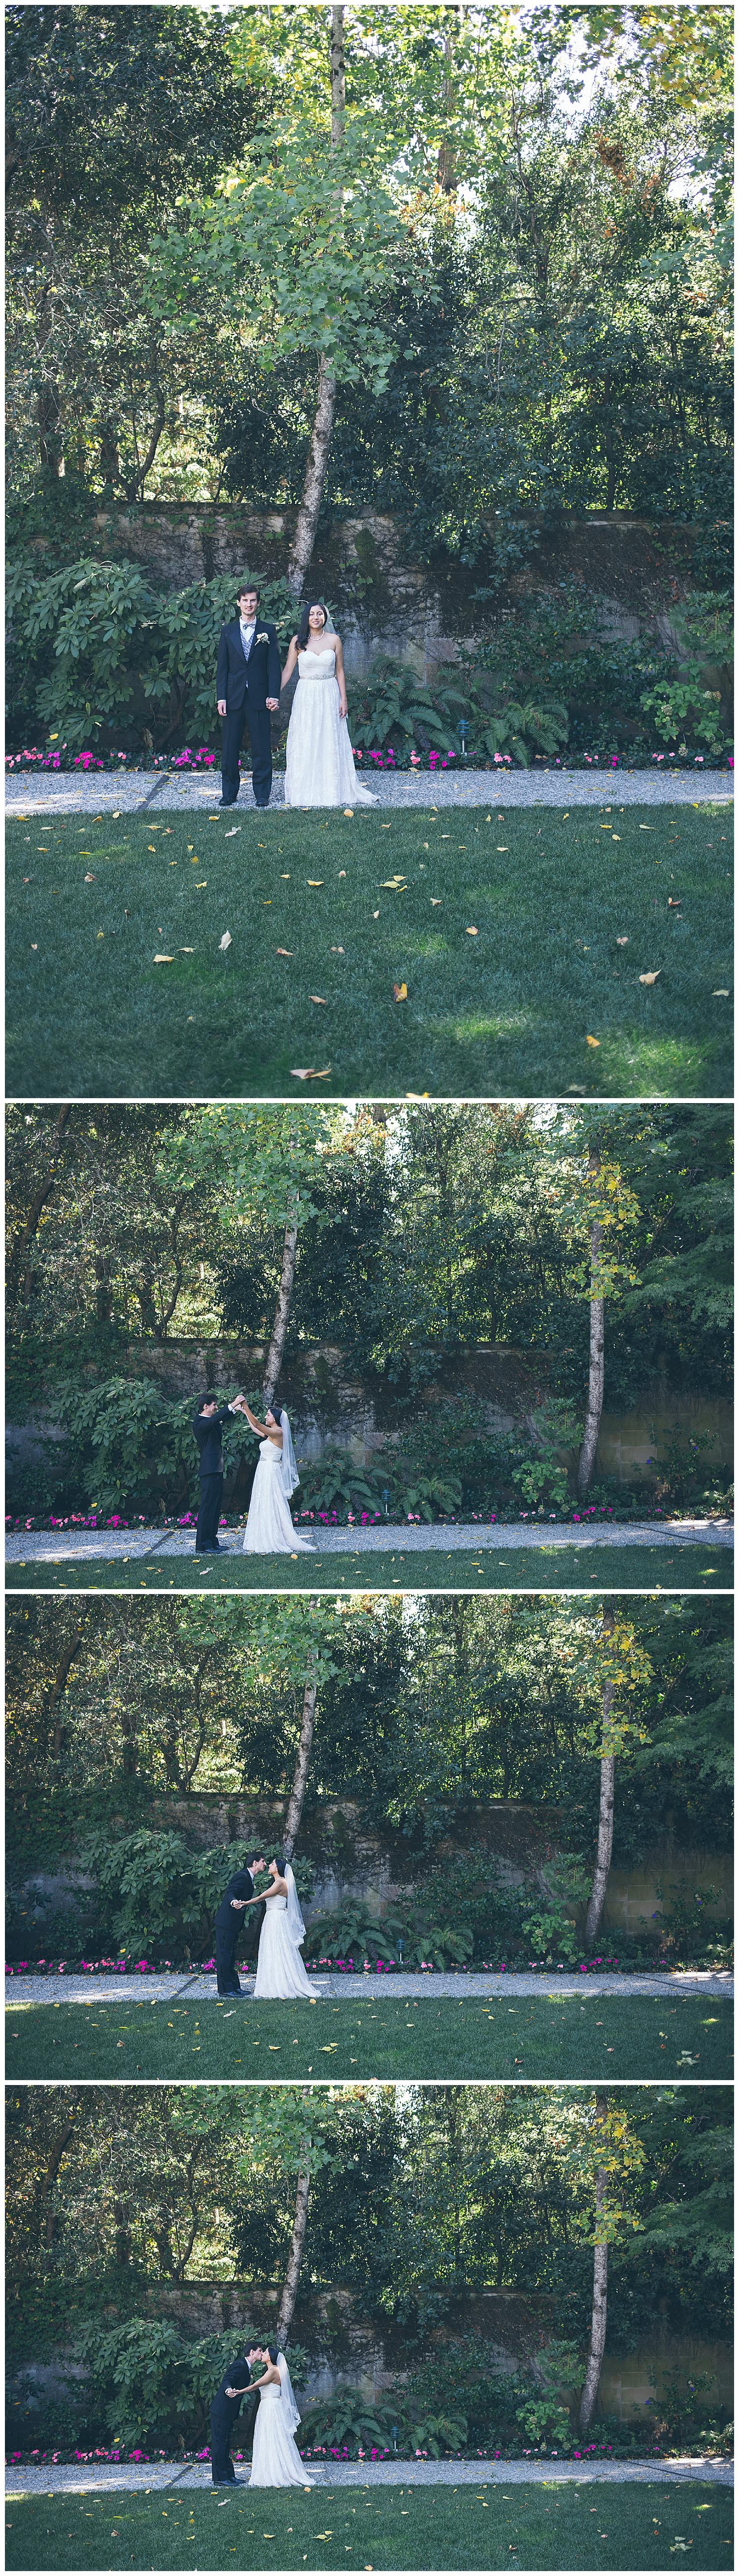 khariza-rae-photography-bay-area-wedding-photographer_0163.jpg